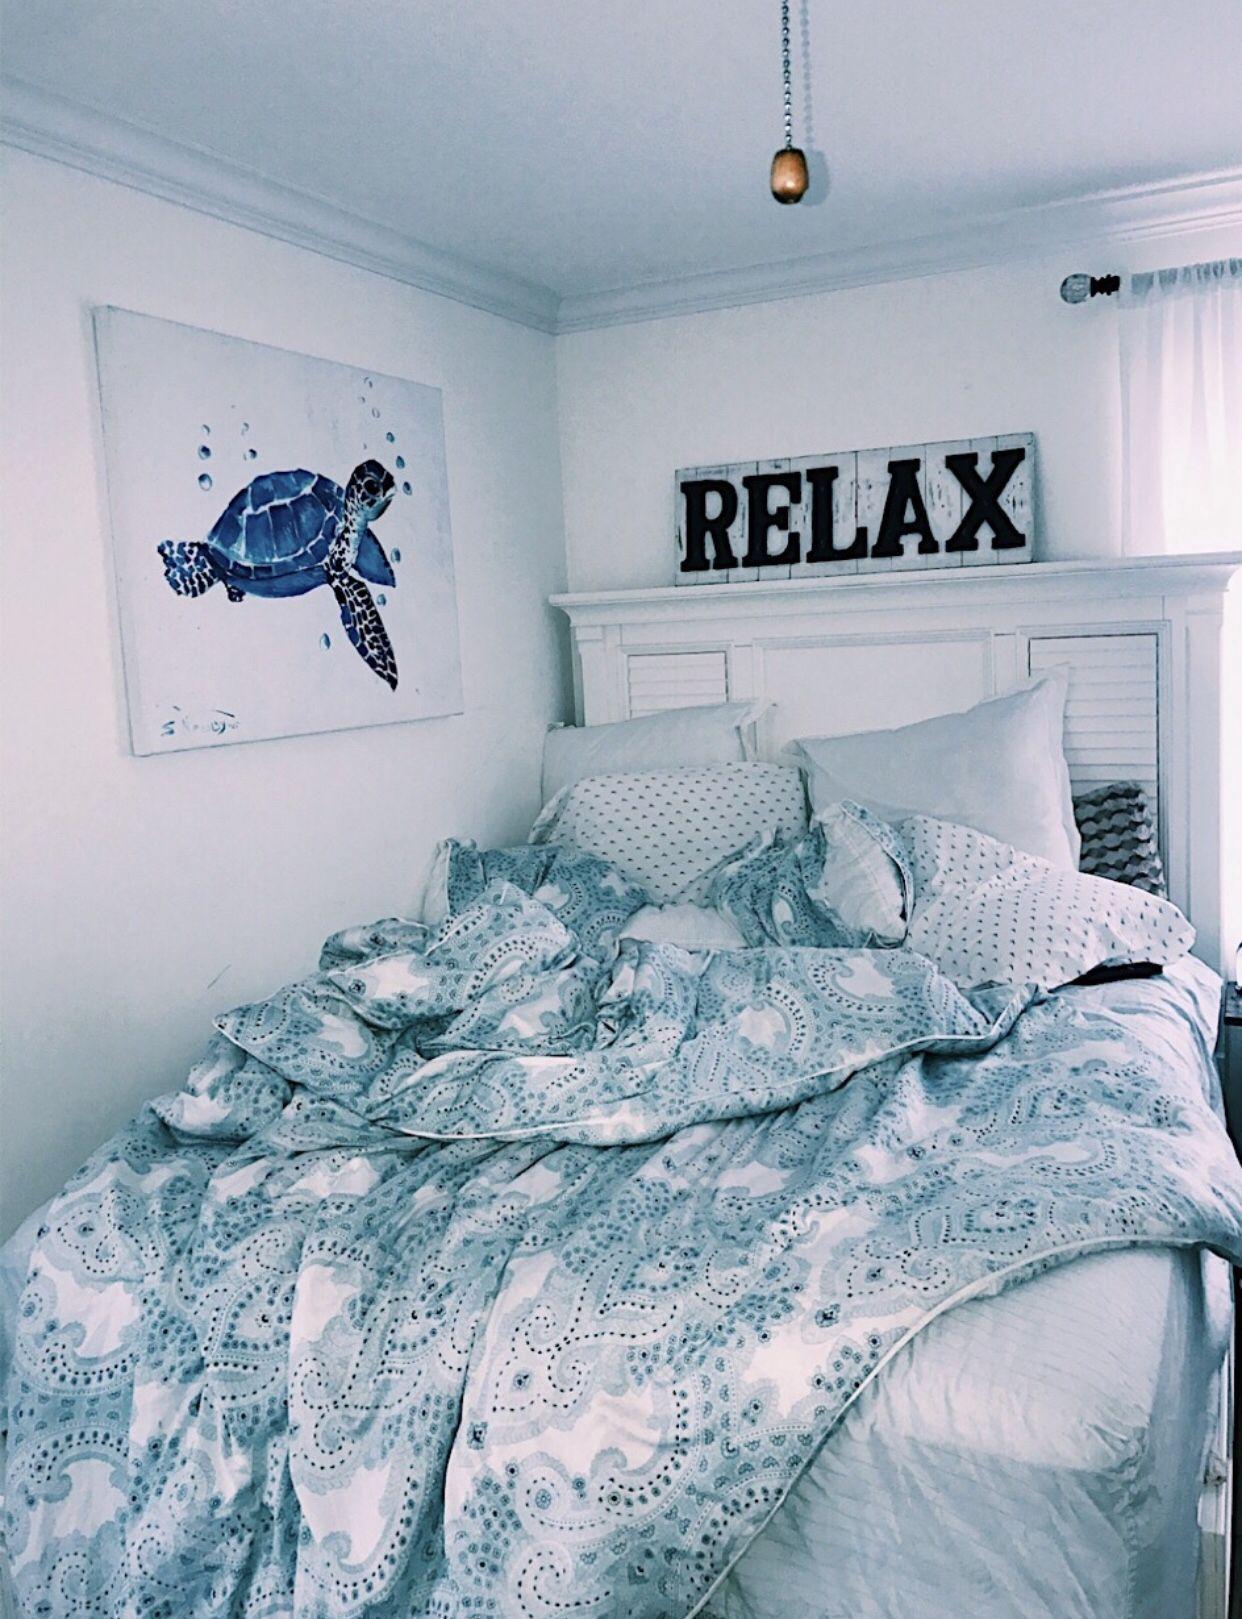 Acirc Vsco Chynamcghee Acirc In 2019 Aesthetic Bedroom Room Inspiration Bedroom Aesthetic Bedroom Dorm Room Decor